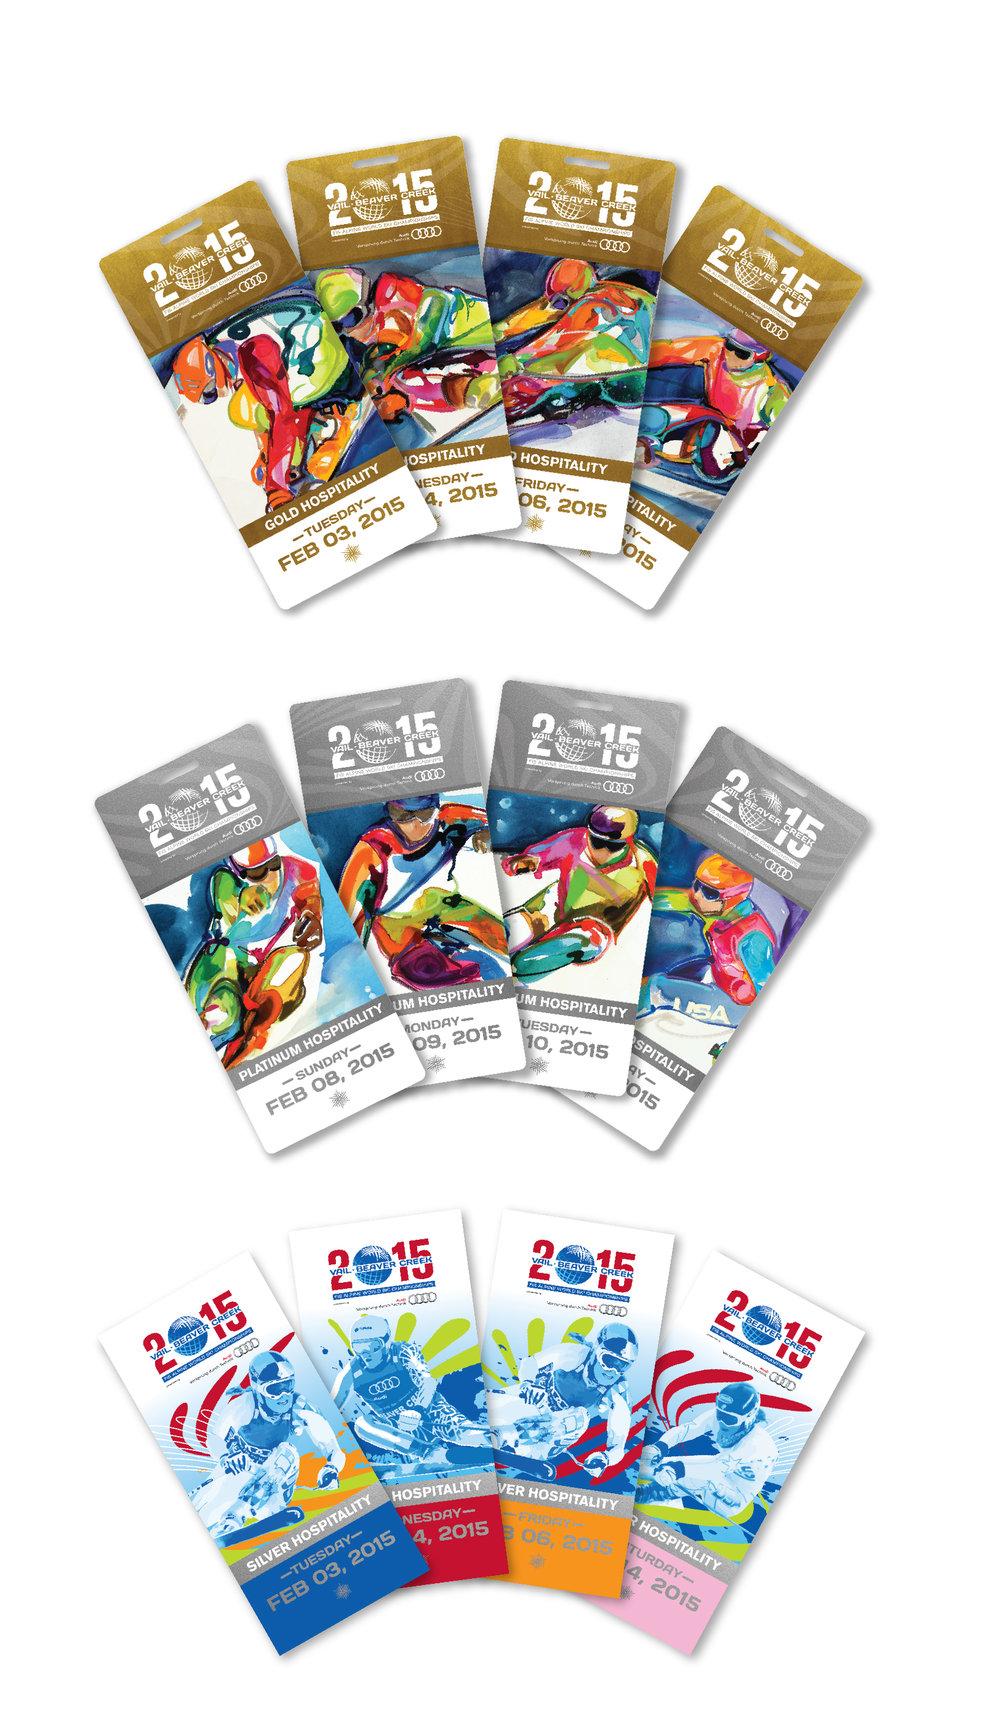 2015_Tickets-02.jpg